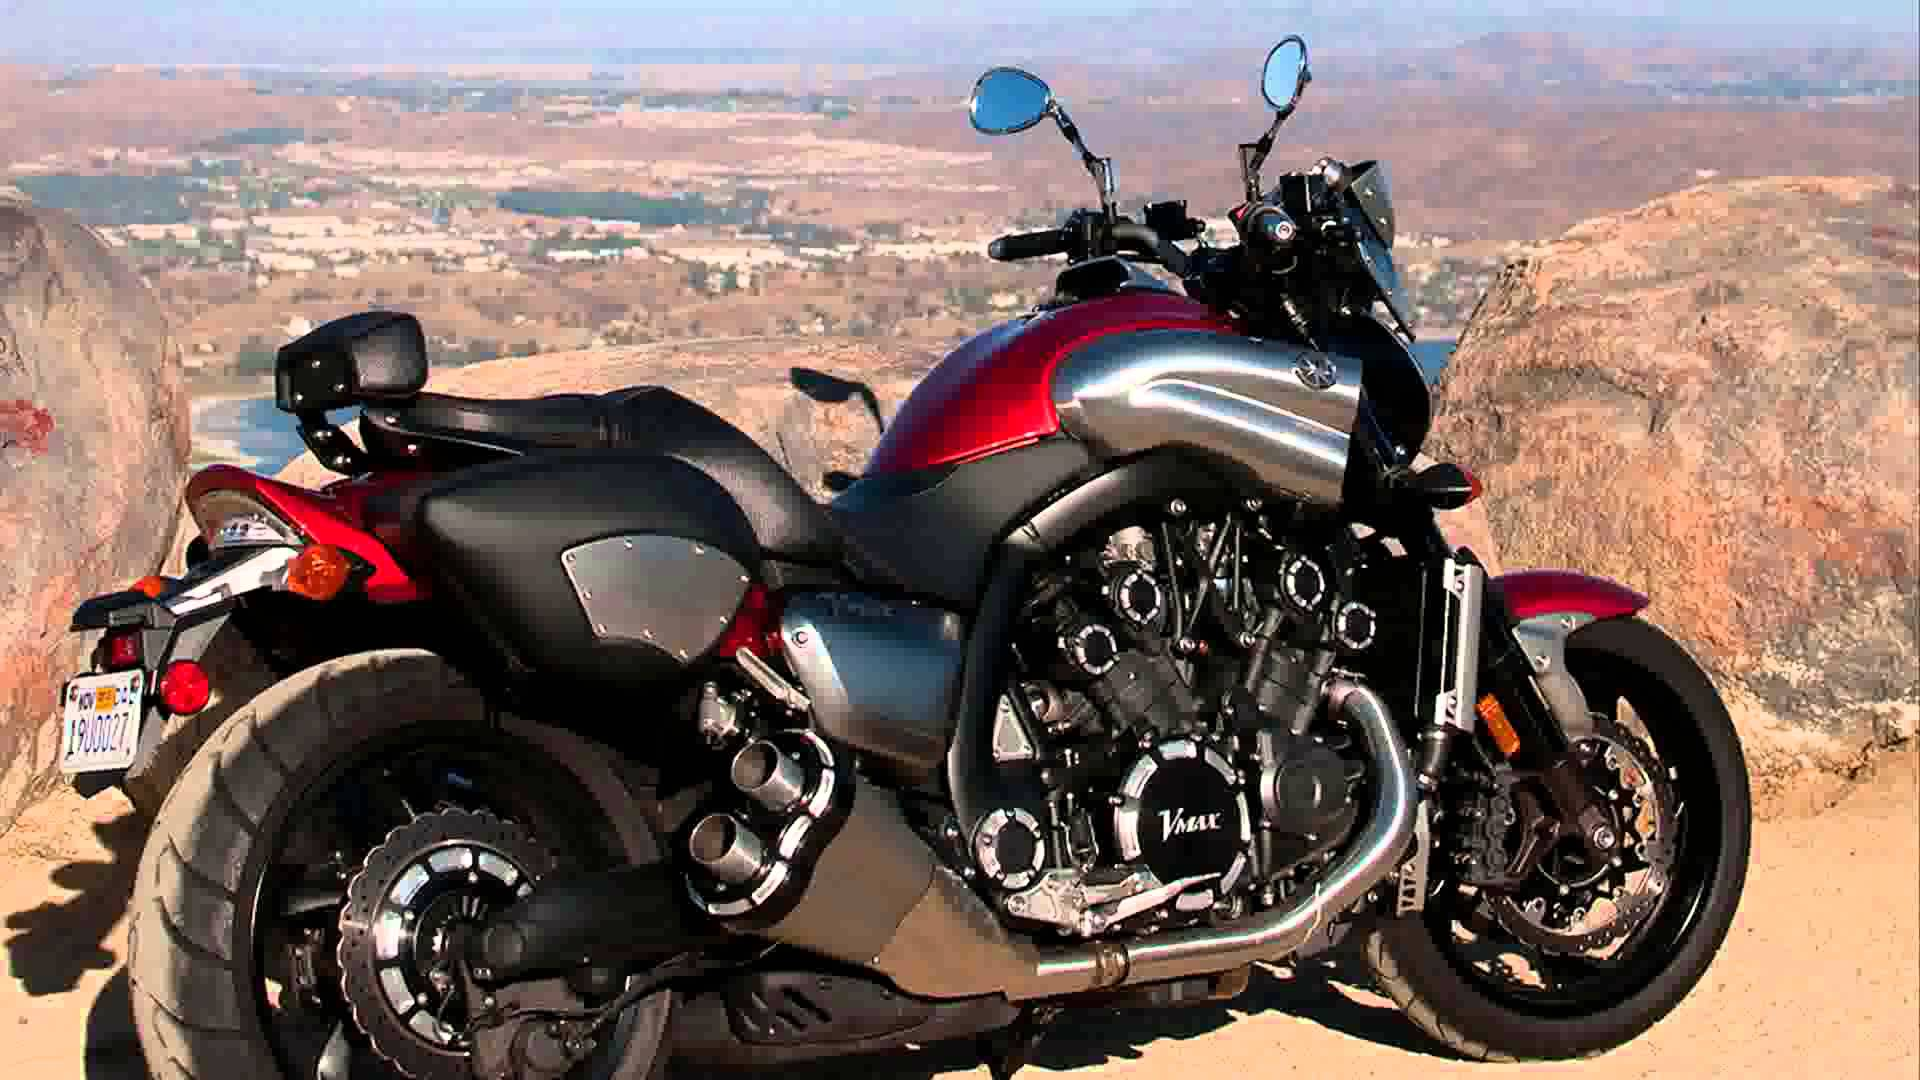 Amazing Yamaha V Max Pictures & Backgrounds